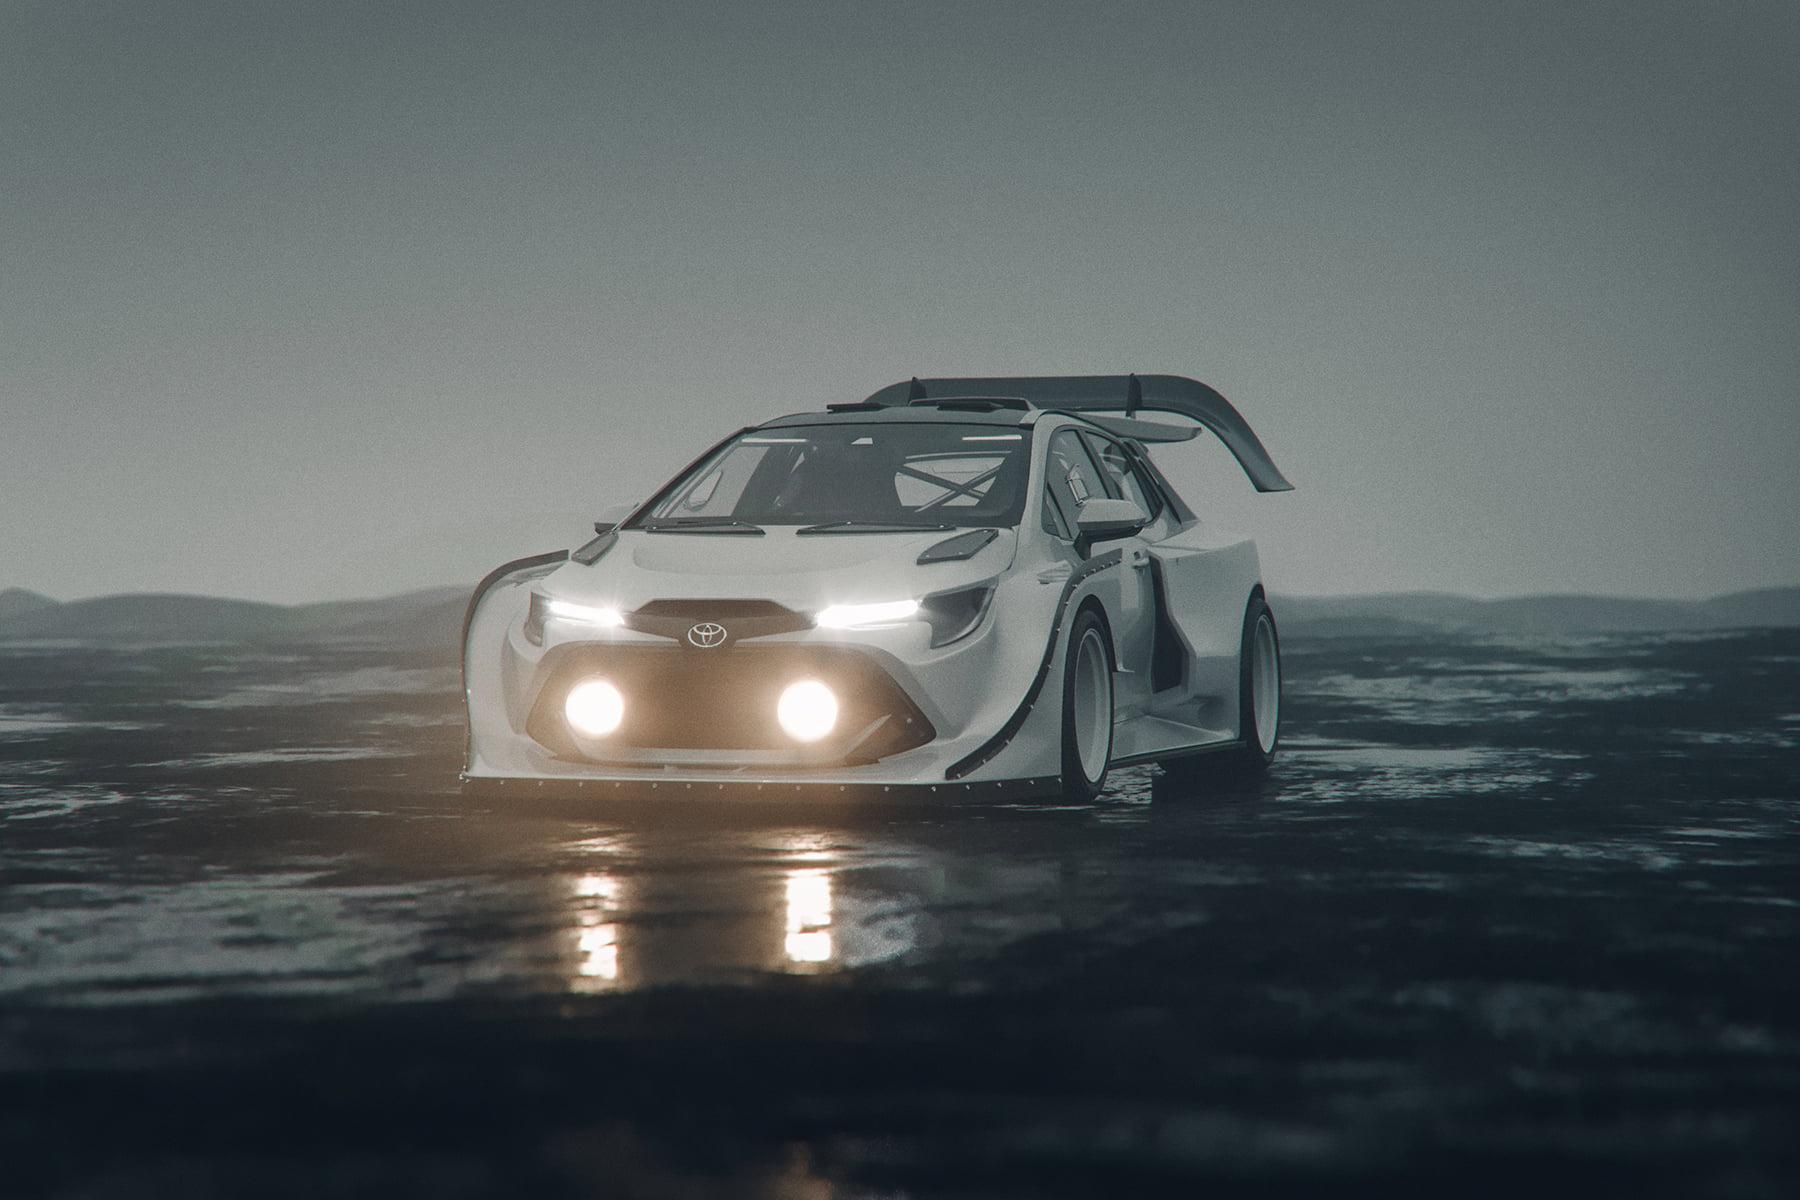 Toyota-GR-Corolla-Group-B-rally-car-4